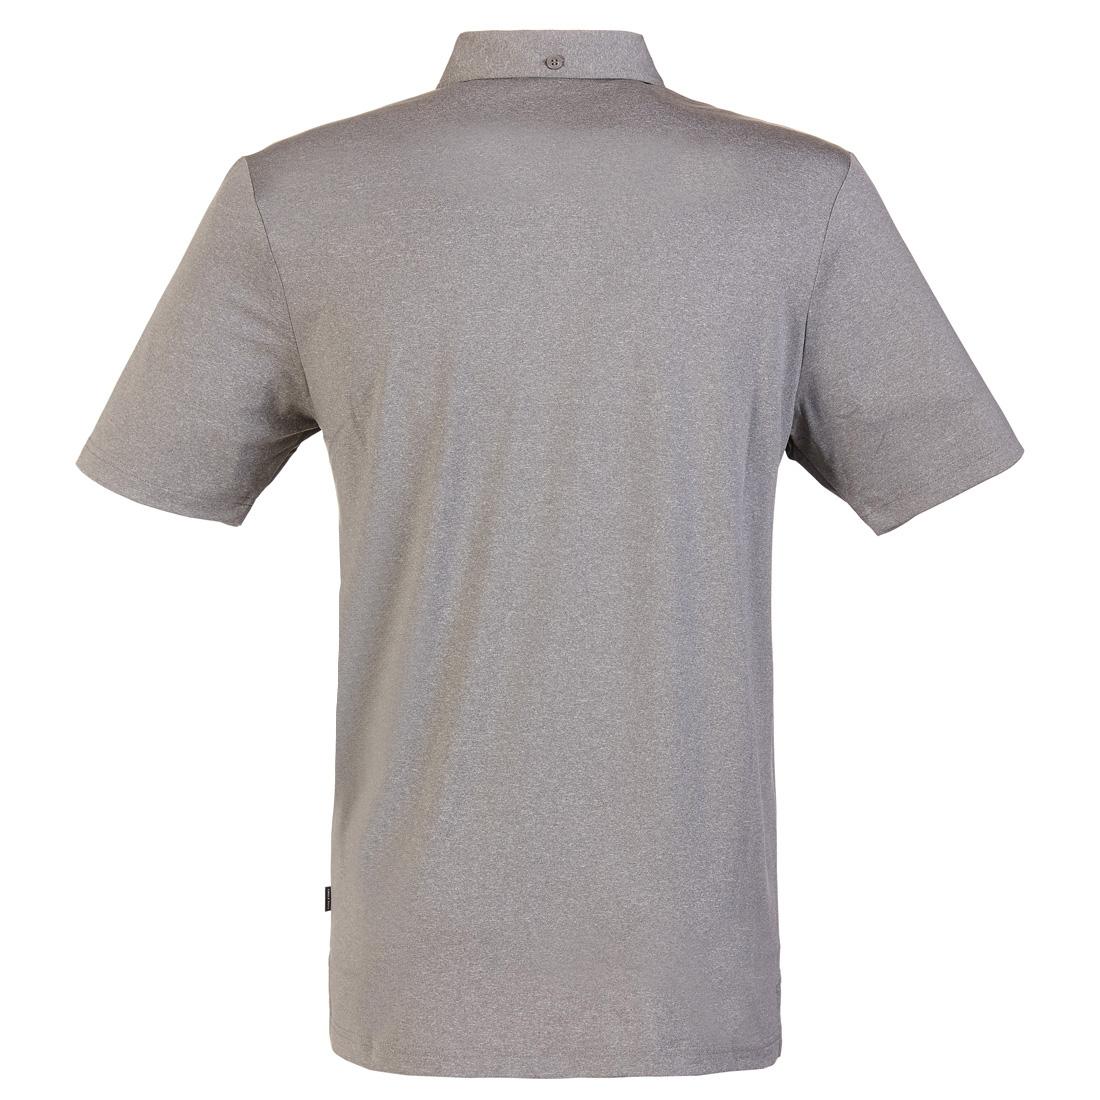 Weiches Golf Shirt